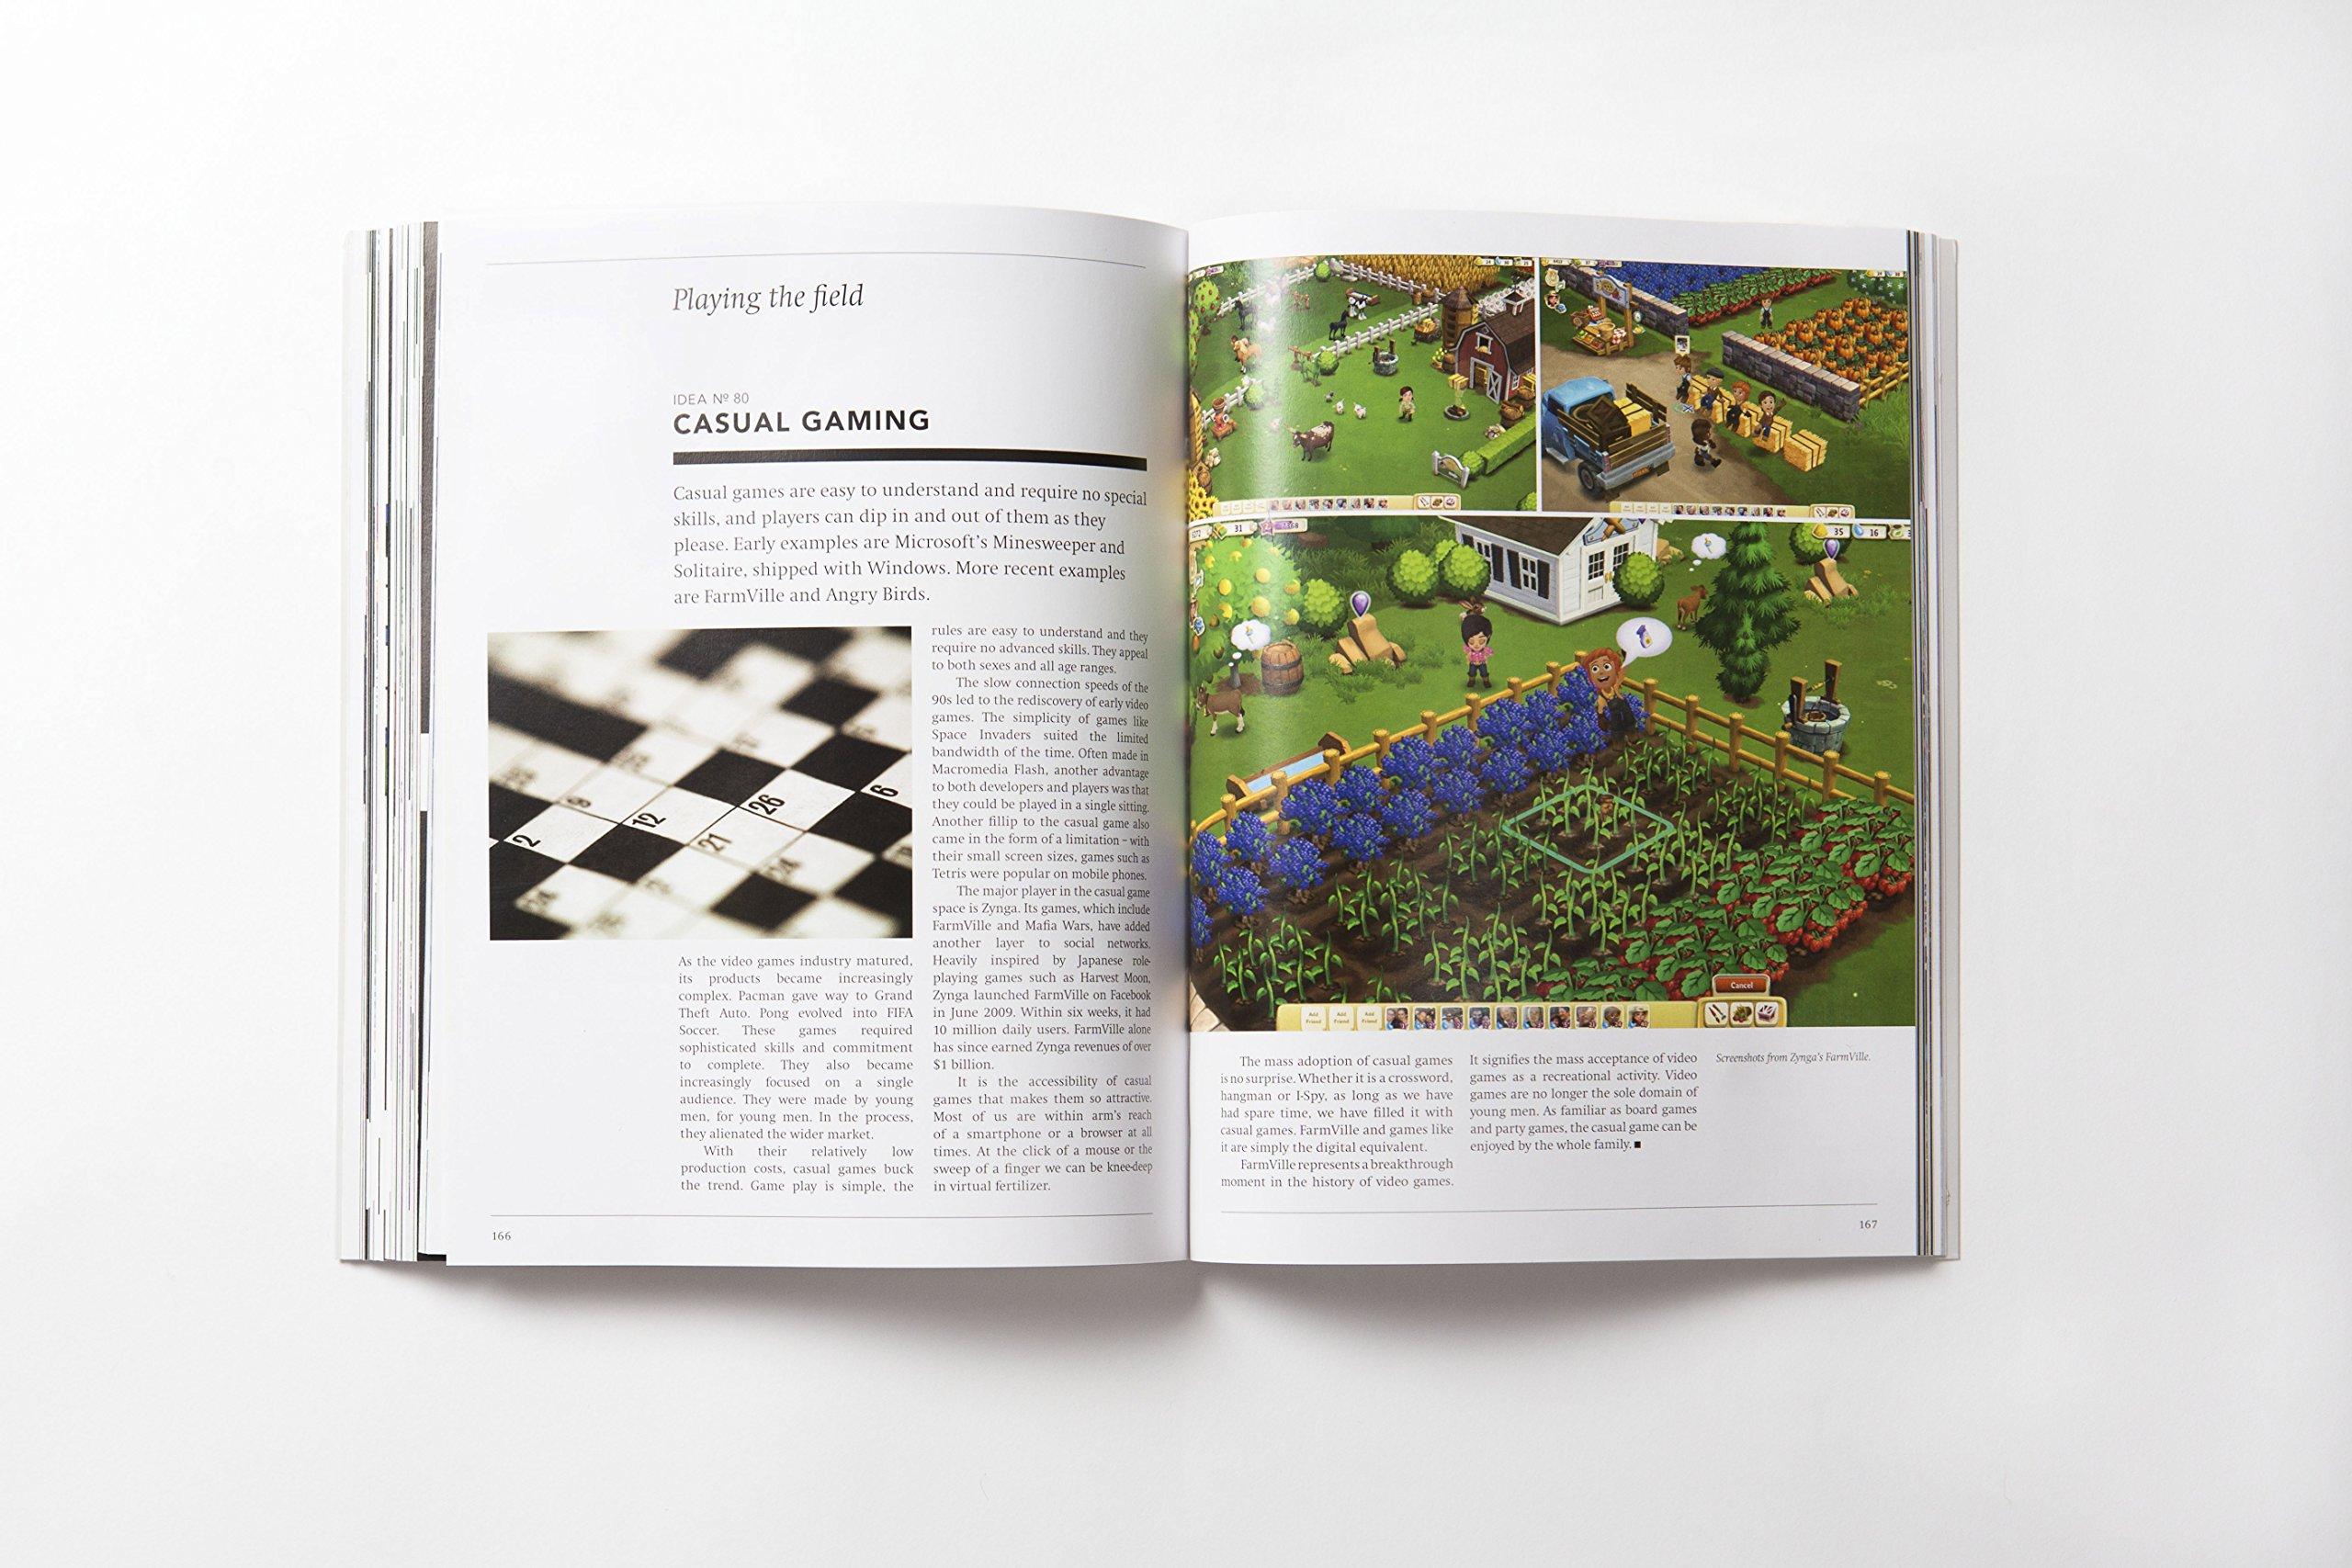 100 Ideas that Changed the Web: Jim Boulton: 9781780673707: Amazon.com:  Books